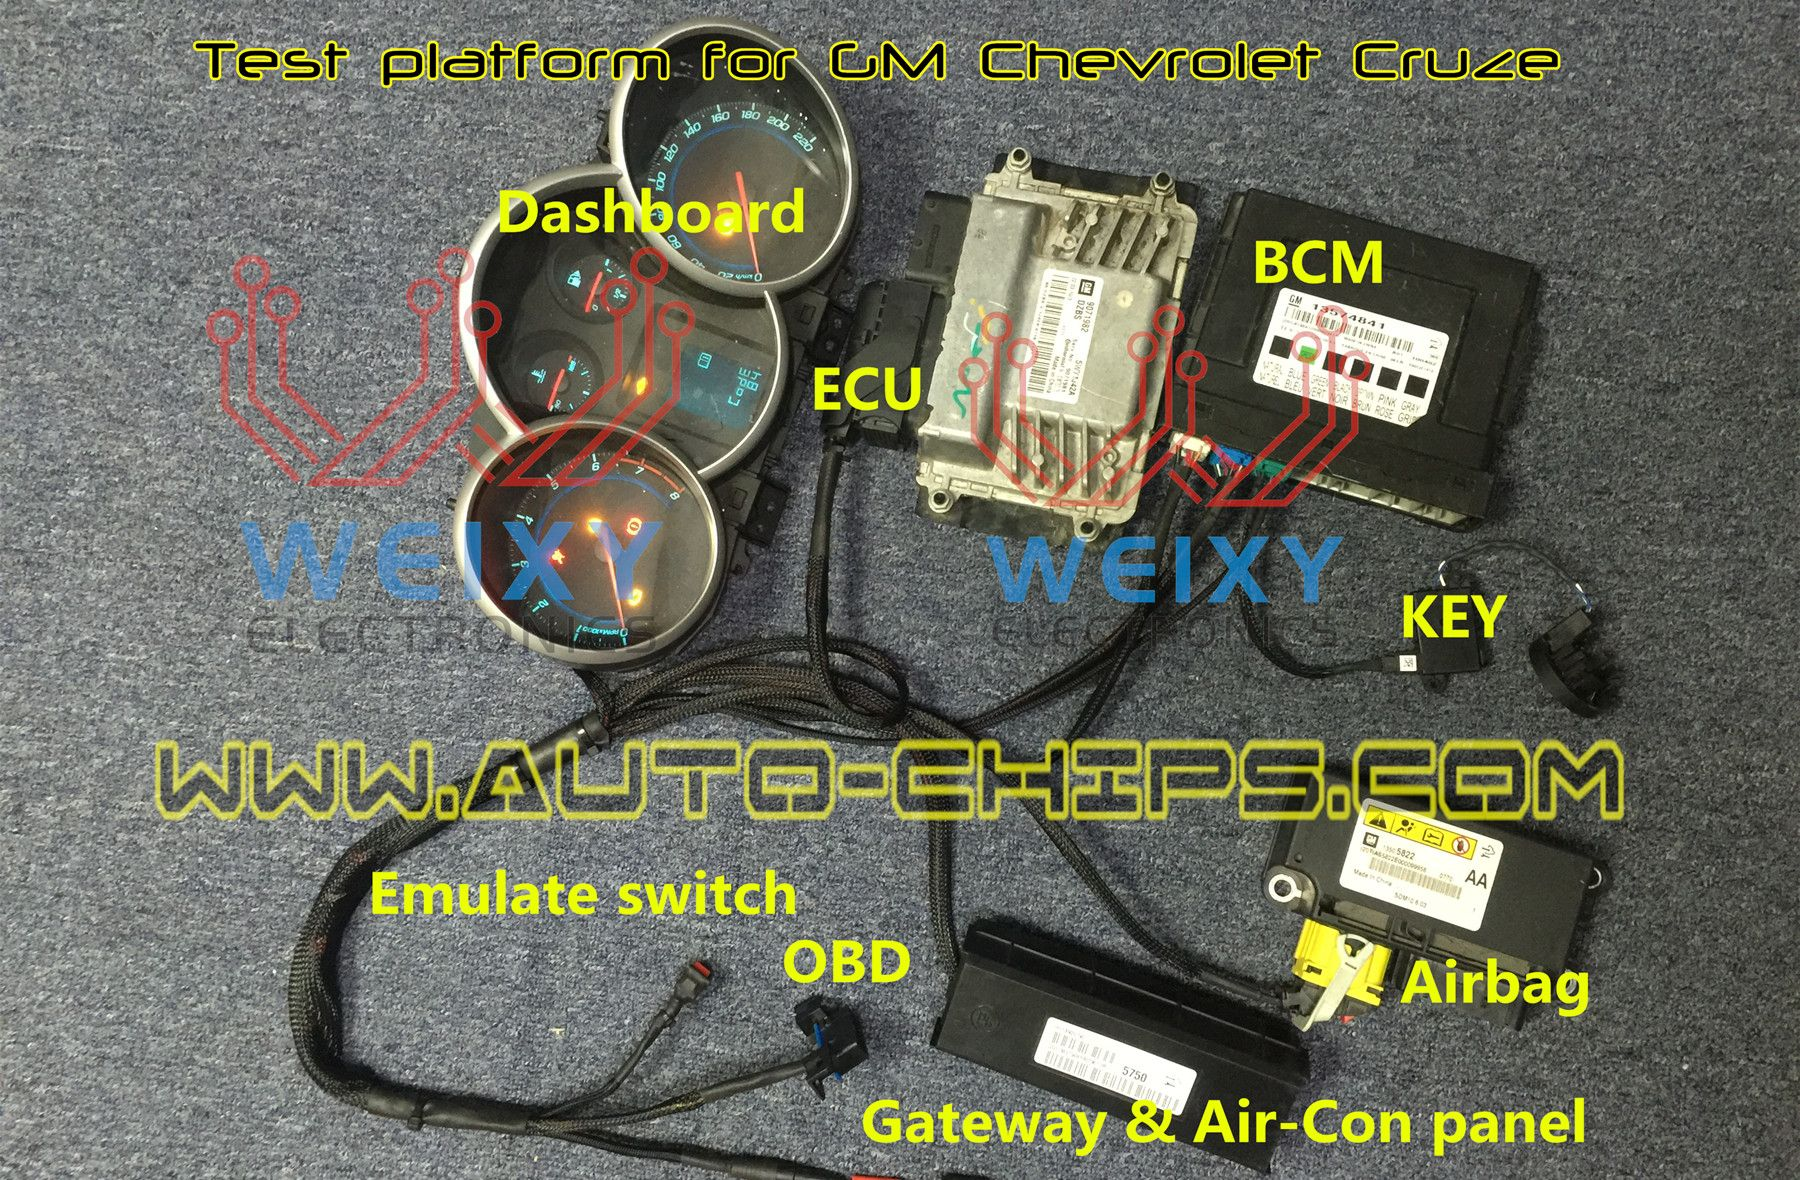 test platform for gm chevrolet cruze enable programing keys on bench restore airbag ecm [ 1800 x 1180 Pixel ]